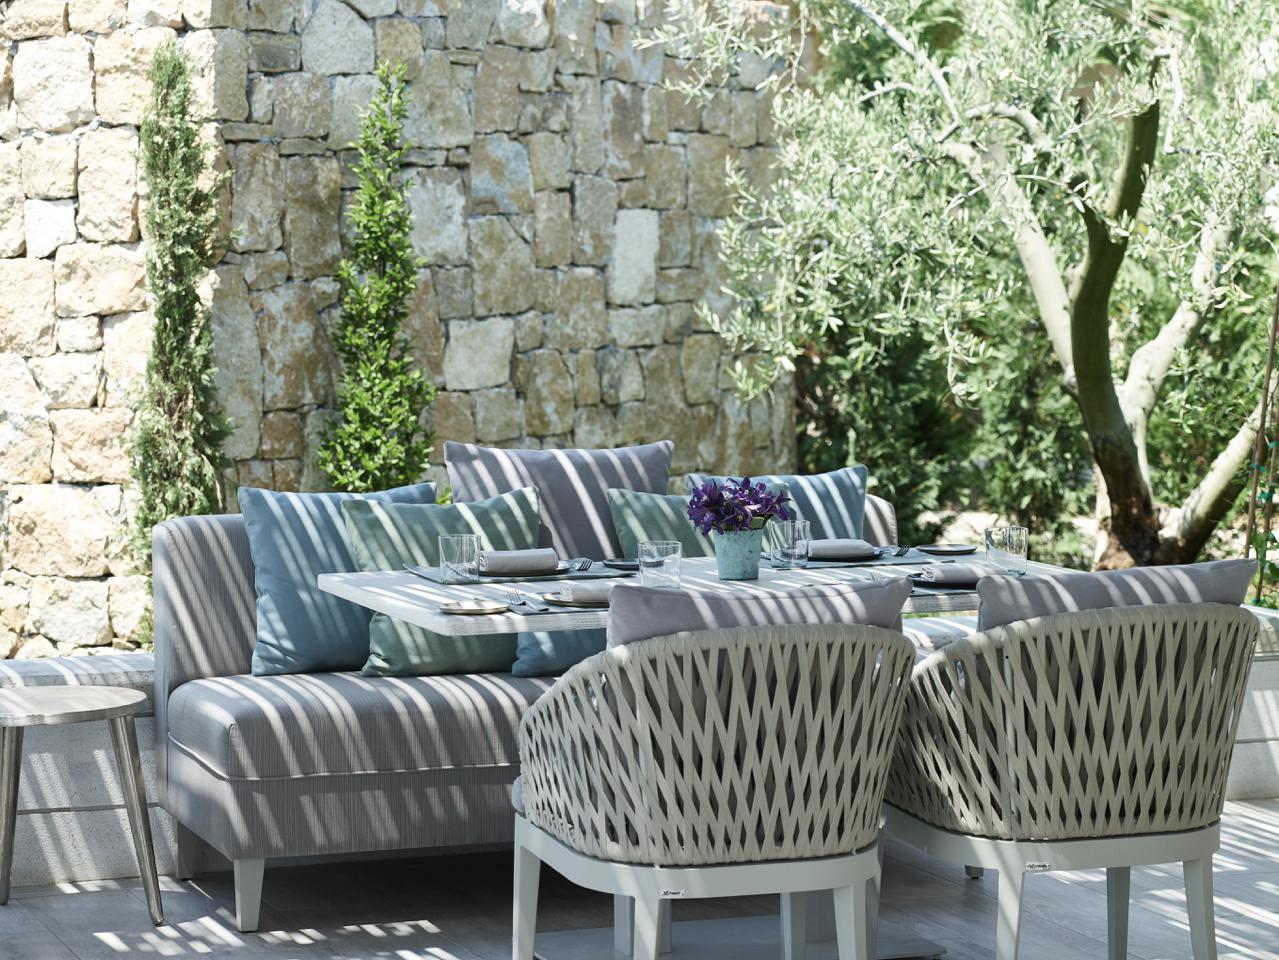 sanidunes-resort-griechenland-luxusresort-aussenbereich-decohome.de_